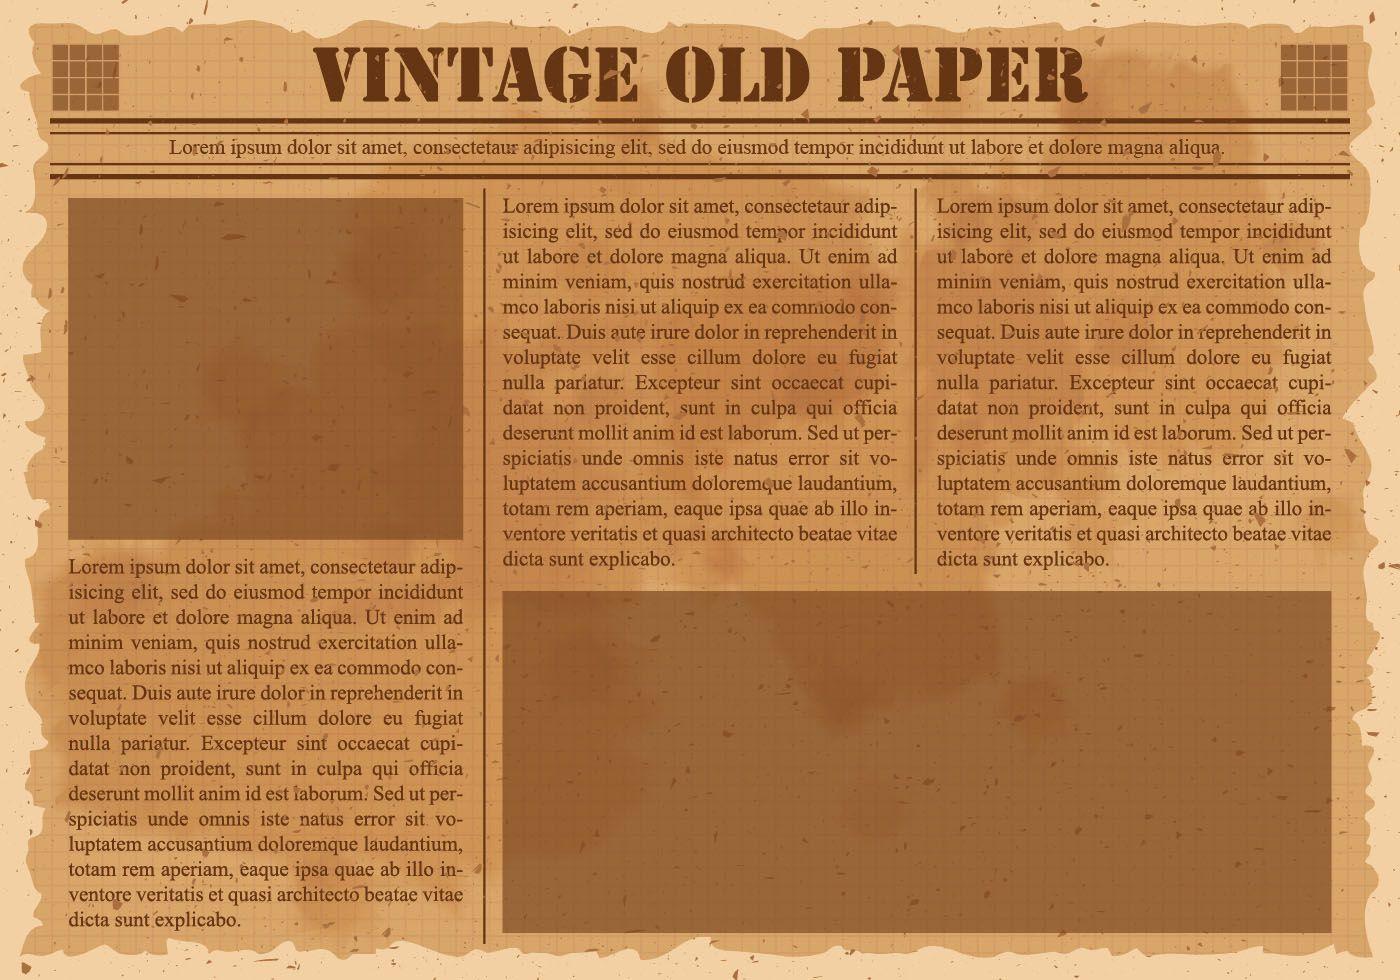 Old Newspaper Free Vector Art 1 682 Free Downloads Regarding Old Blank Newspaper Template In 2020 Newspaper Template Newspaper Template Word Blank Newspaper